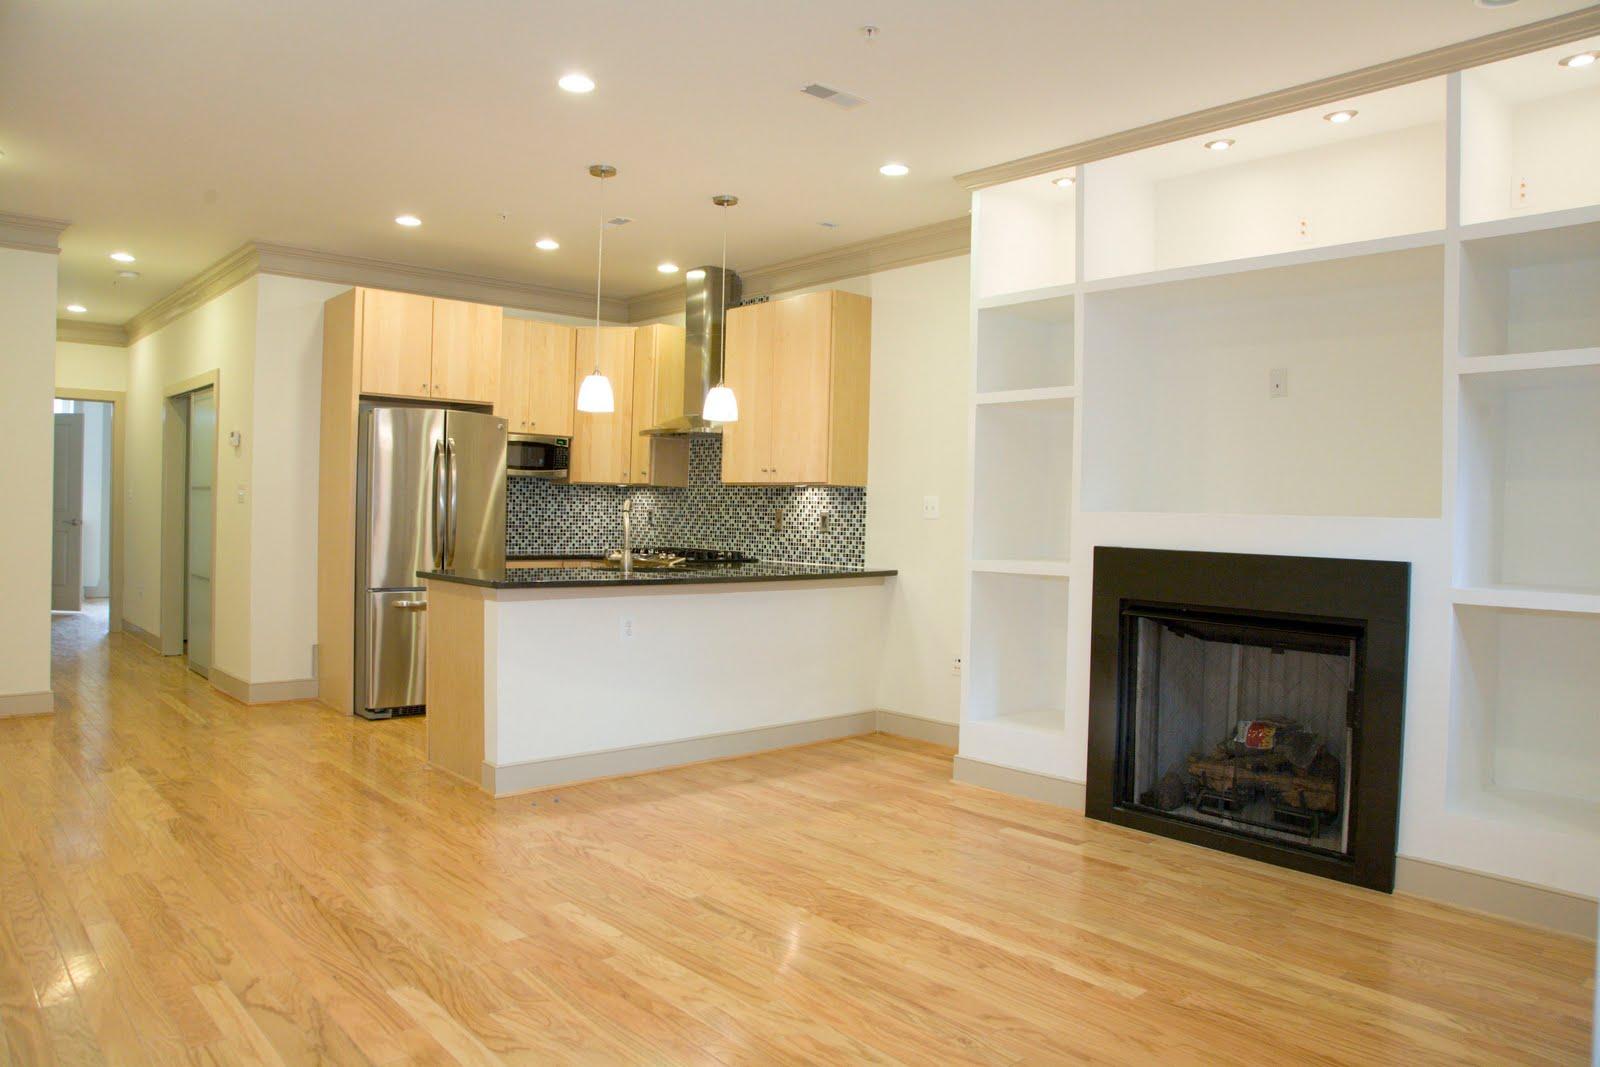 Lock 7 Development, LLC: Kitchen Ideas